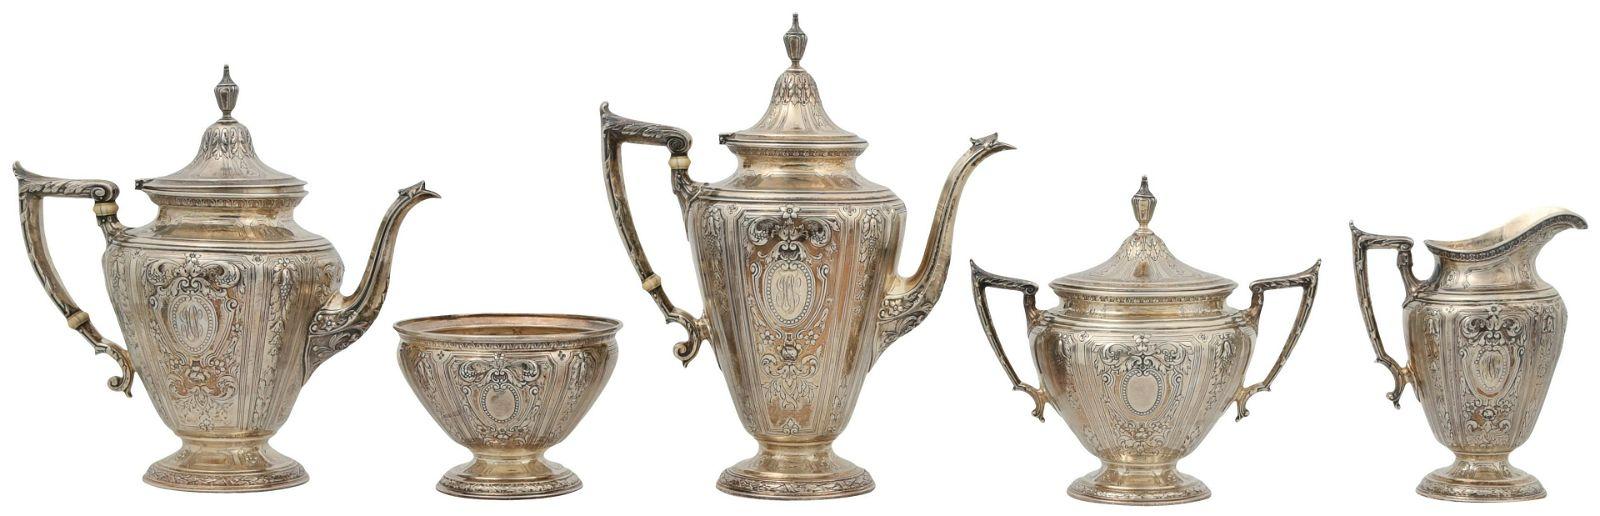 Gorham Mfg. Co. Sterling Silver Tea & Coffee Service